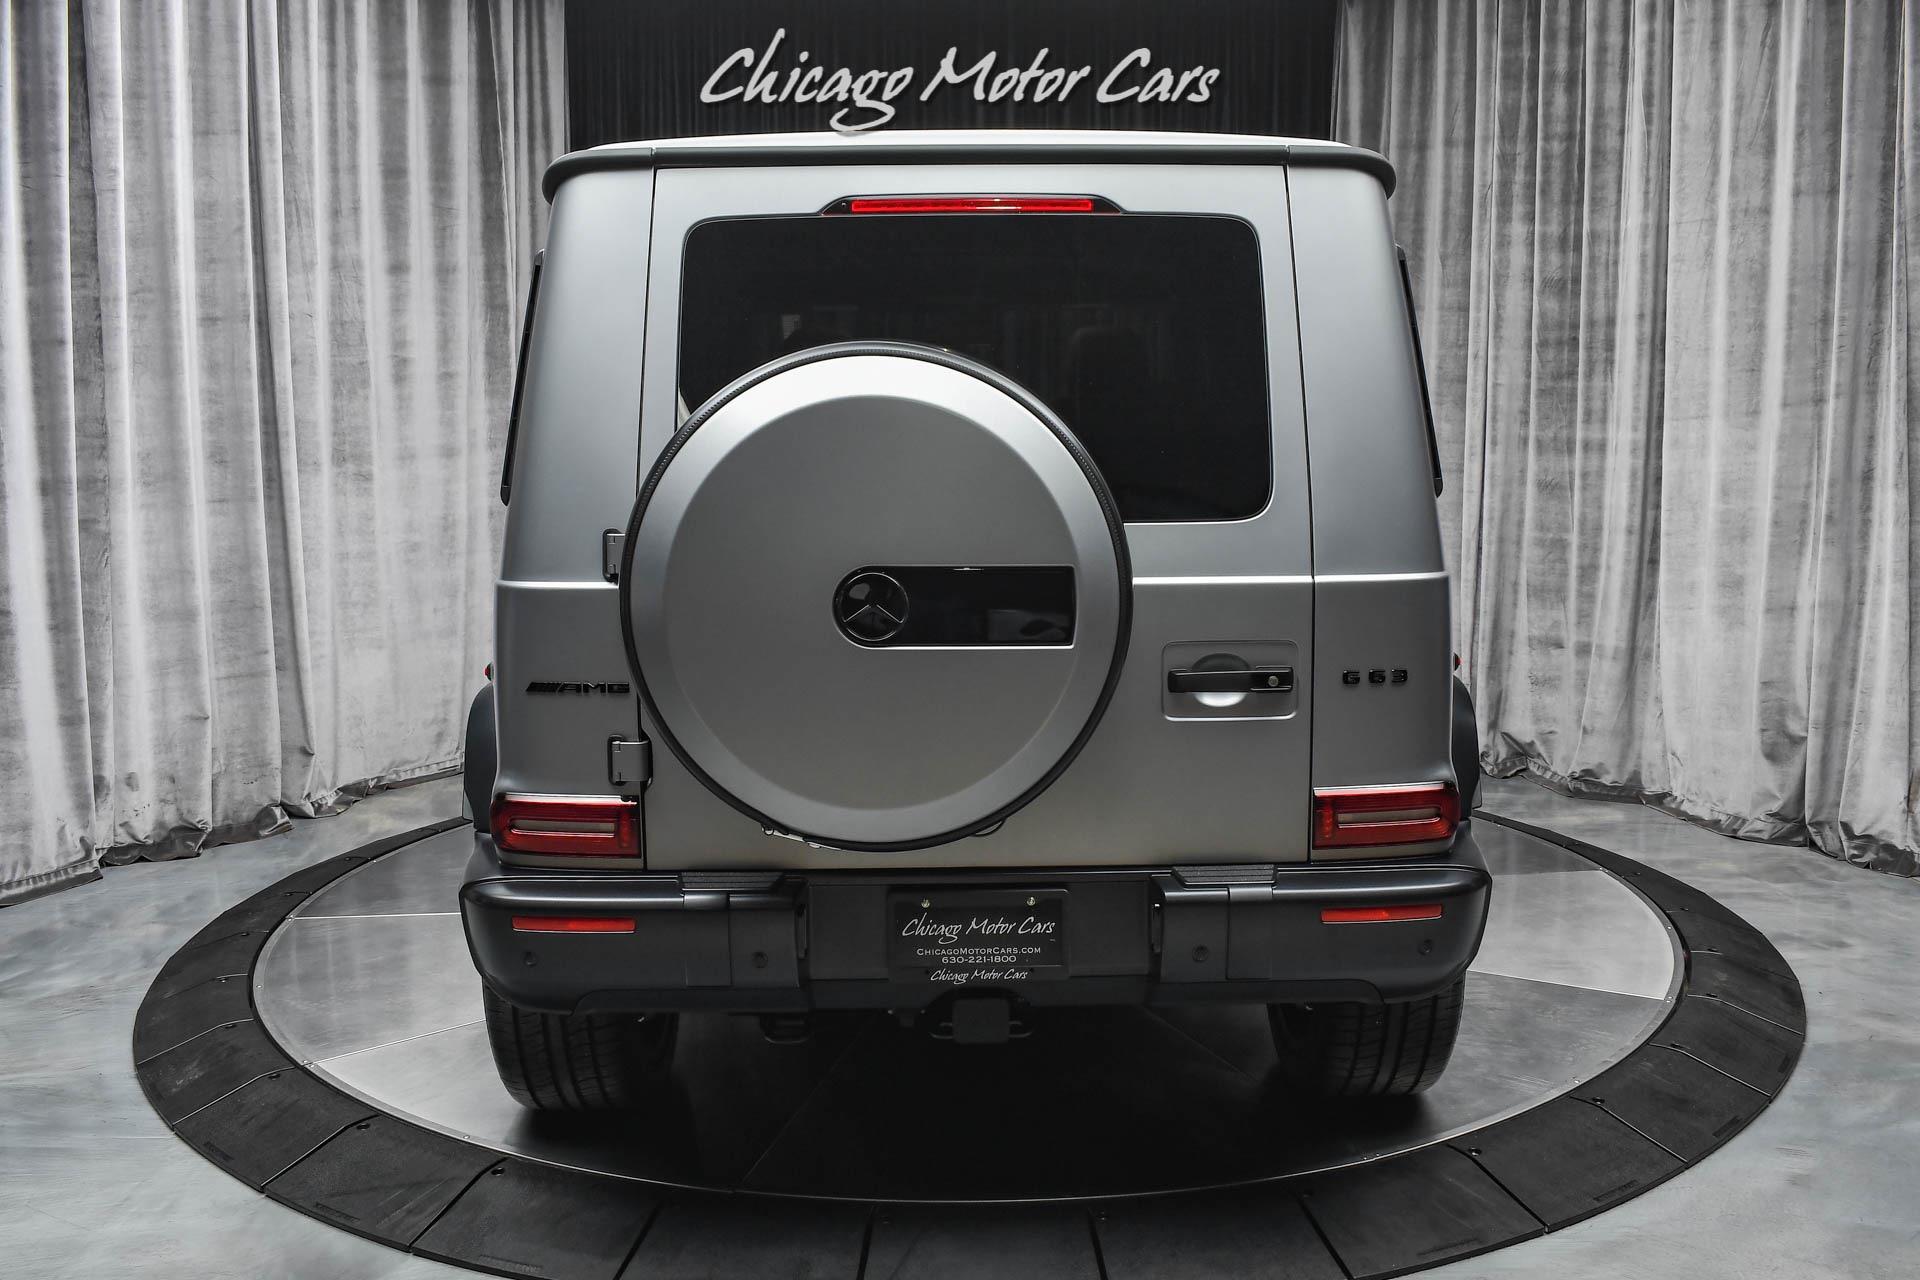 Used-2021-Mercedes-Benz-G63-AMG-4-Matic-AMG-4-Matic-SUV-Hottest-Color-Combo-RARE-Designo-Platinum-Magno